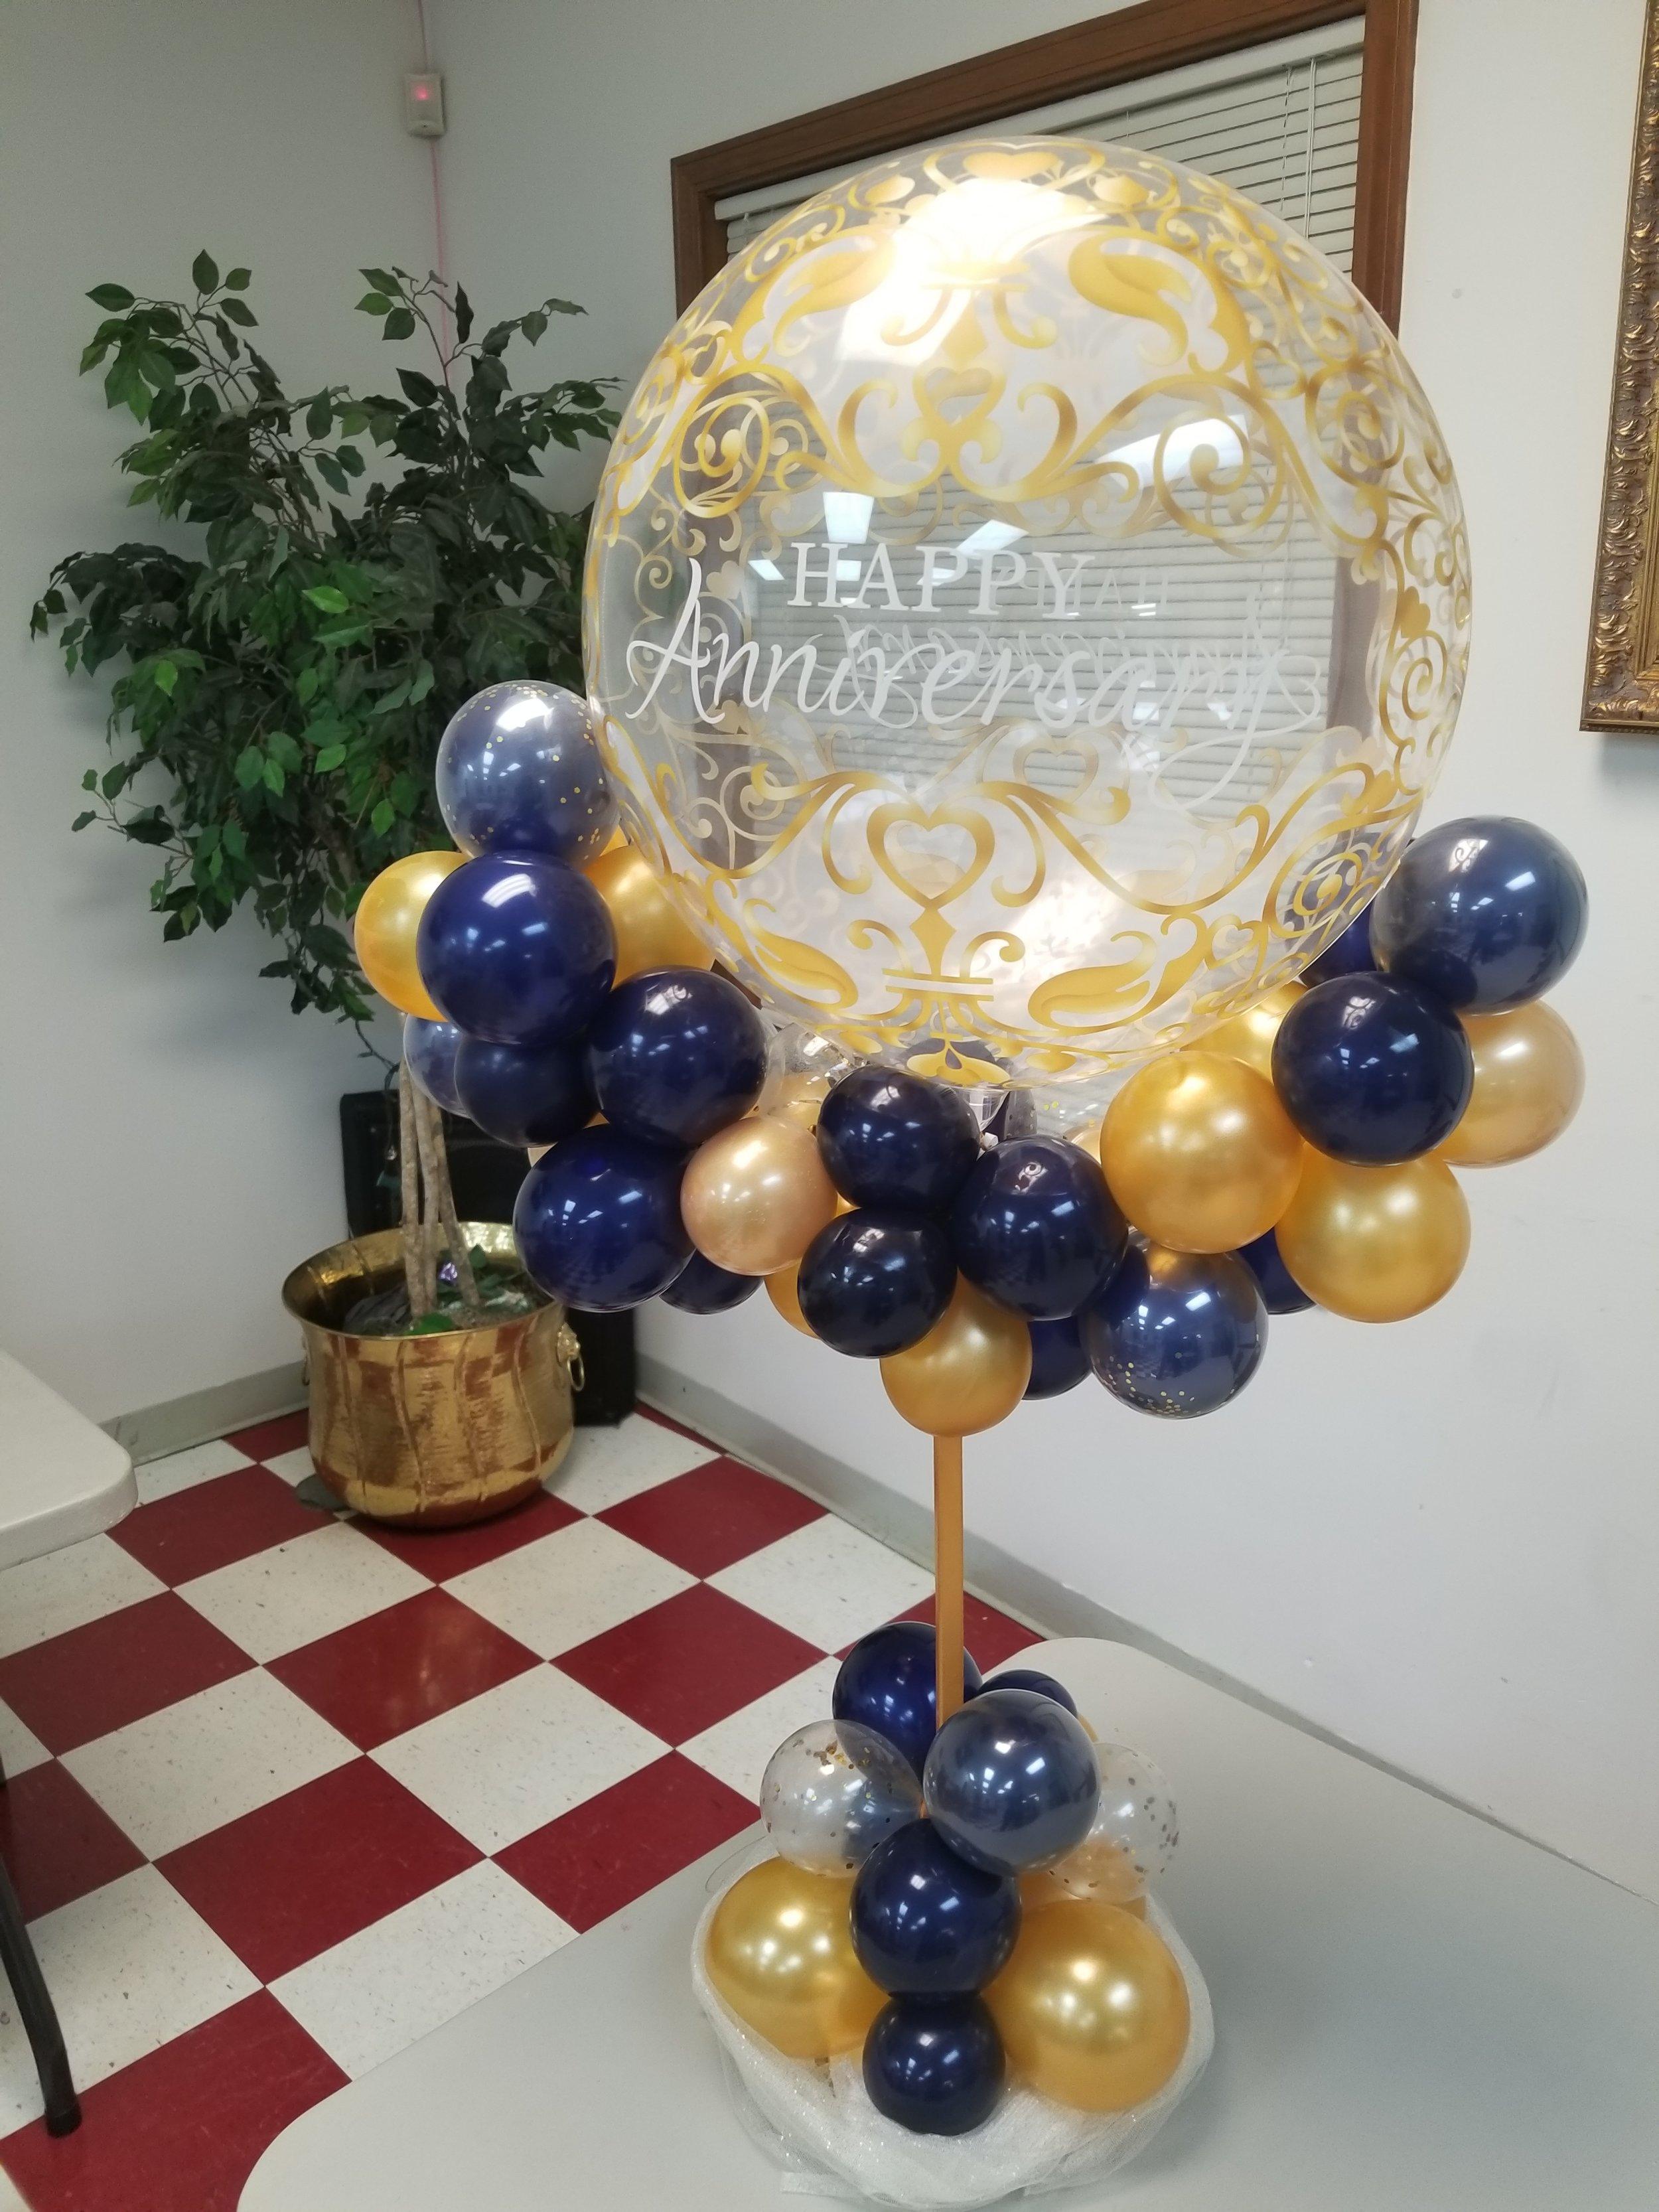 Church anniversary balloon centerpiece.jpg